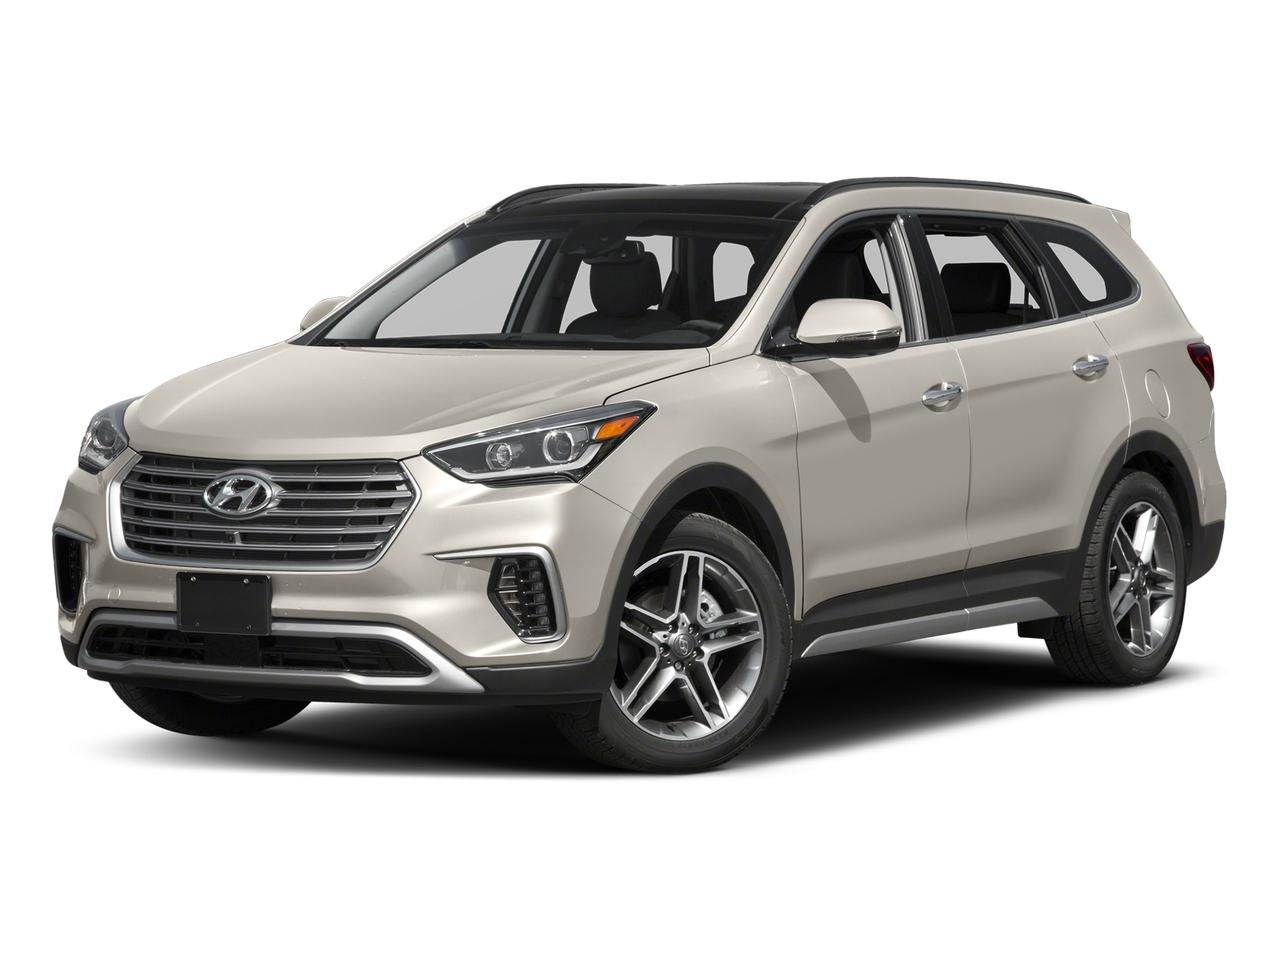 2017 Hyundai Santa Fe LIMITED ULTIMATE SUV Slide